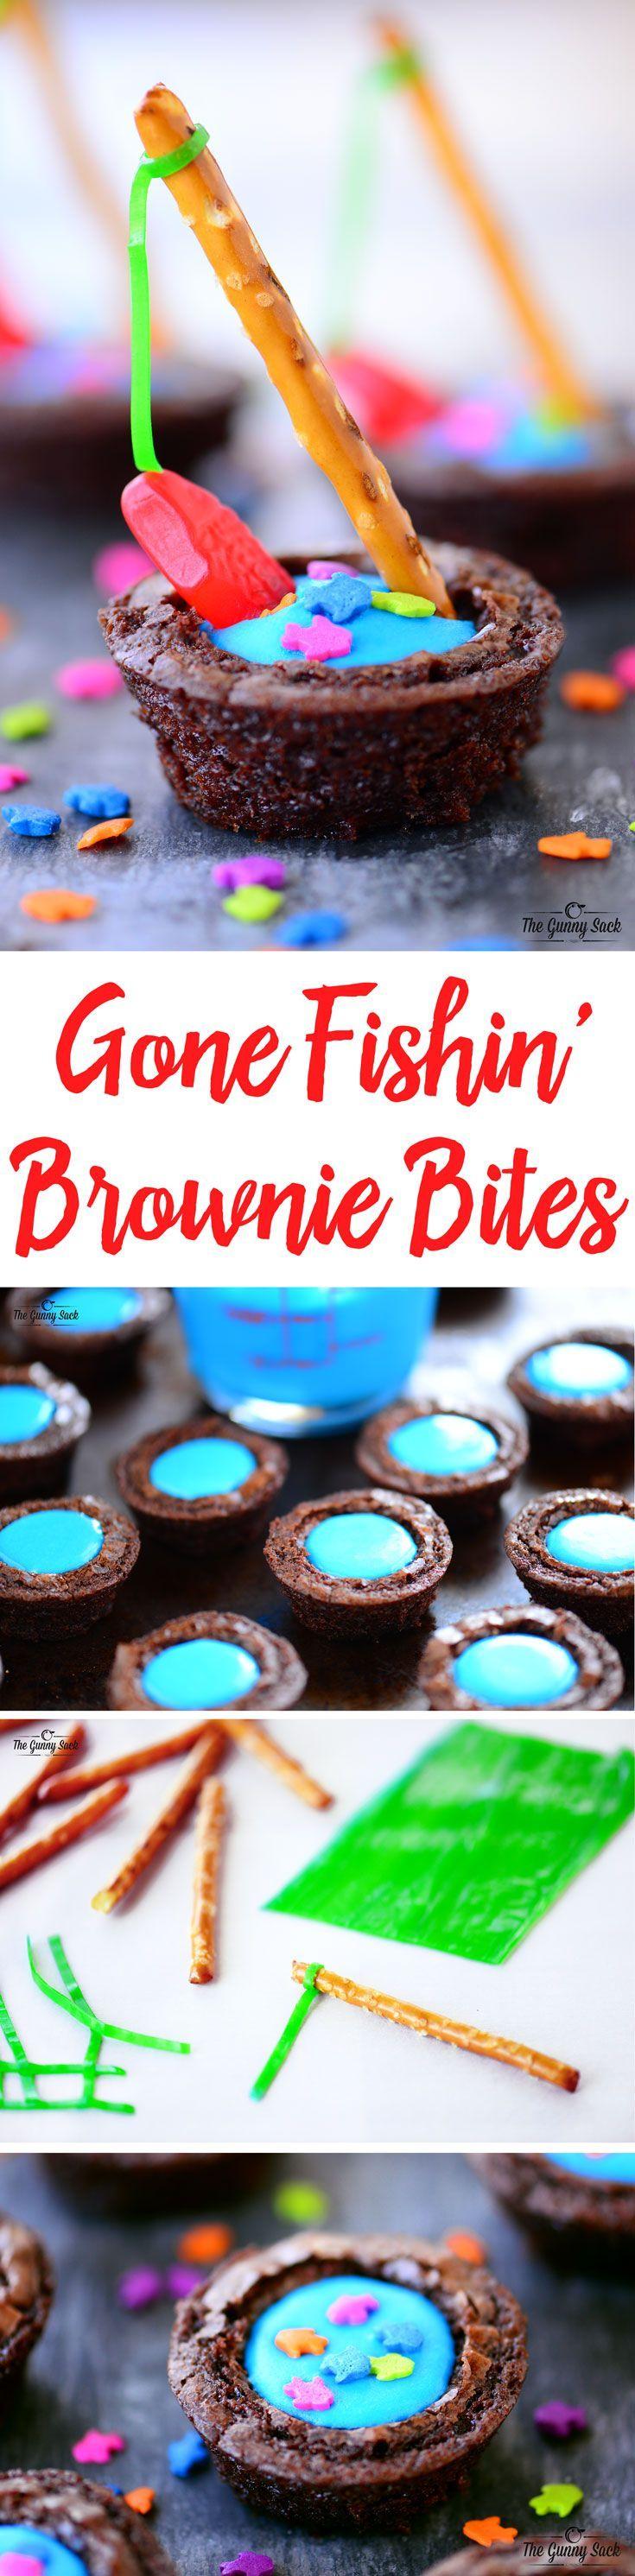 Gmail theme gone - Gone Fishin Brownie Bites